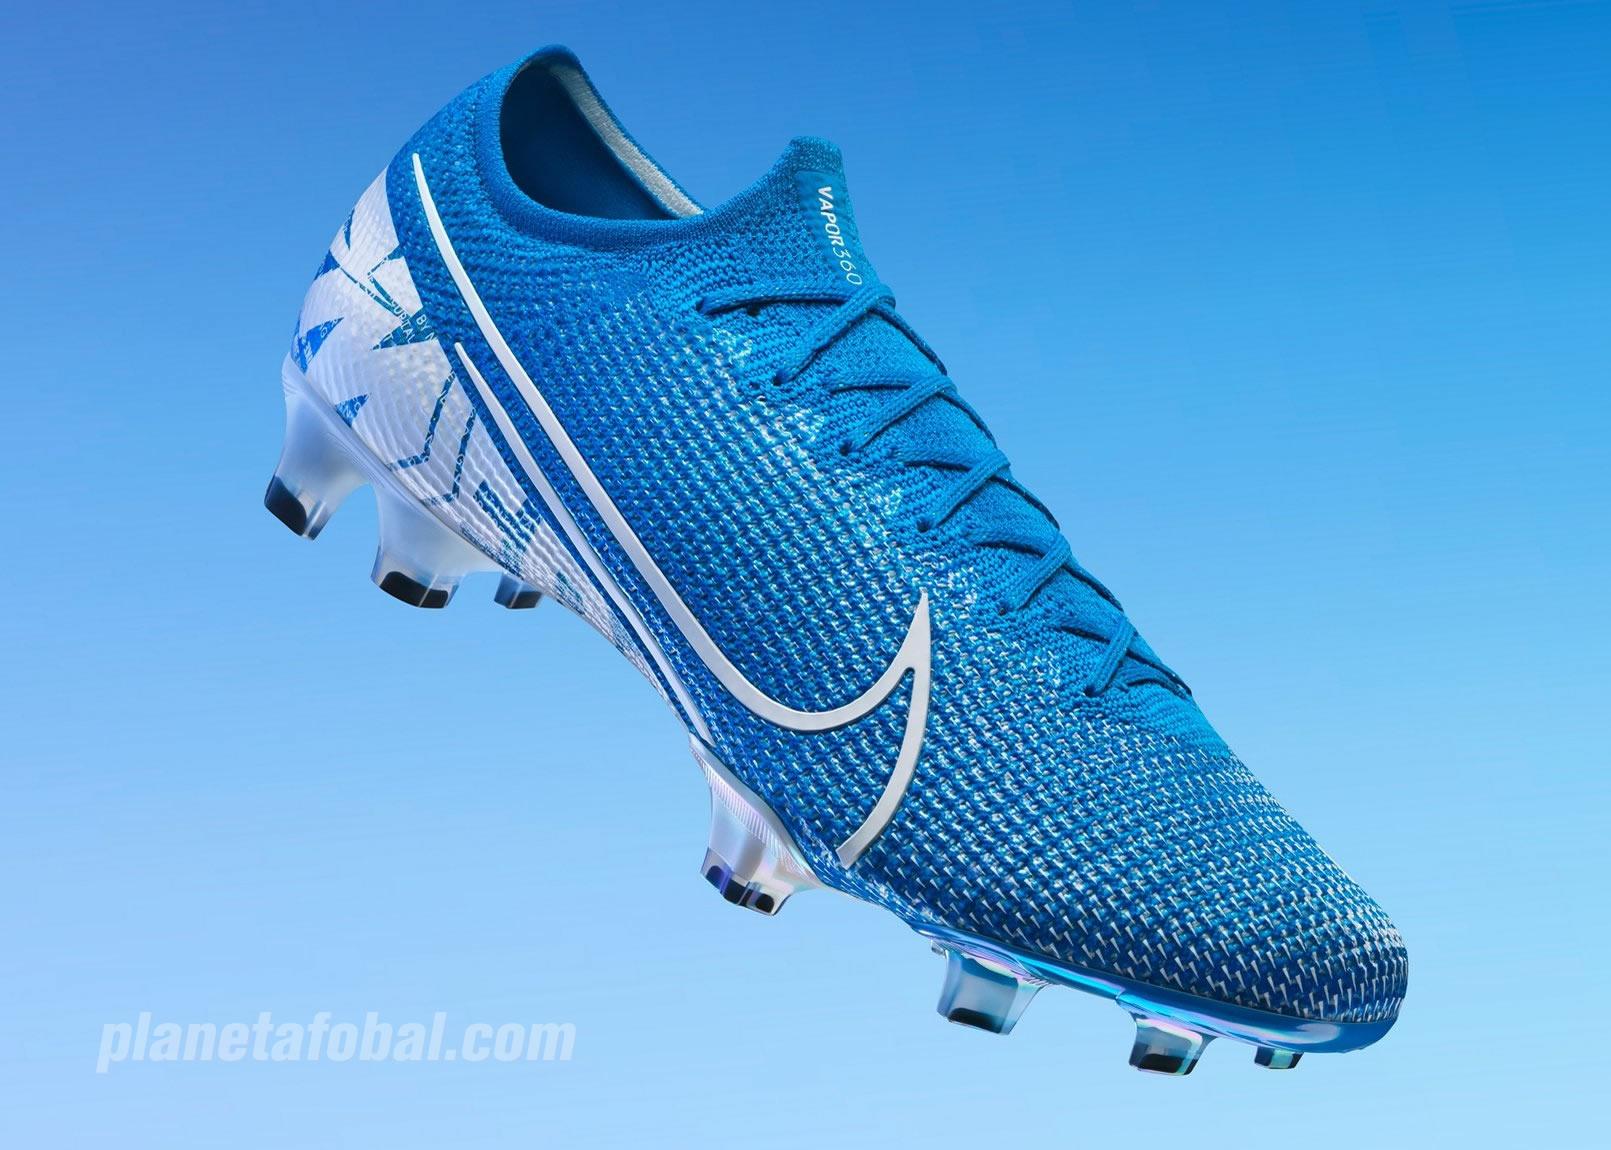 Nuevos botines Nike Mercurial 360 2019 | Imagen Nike